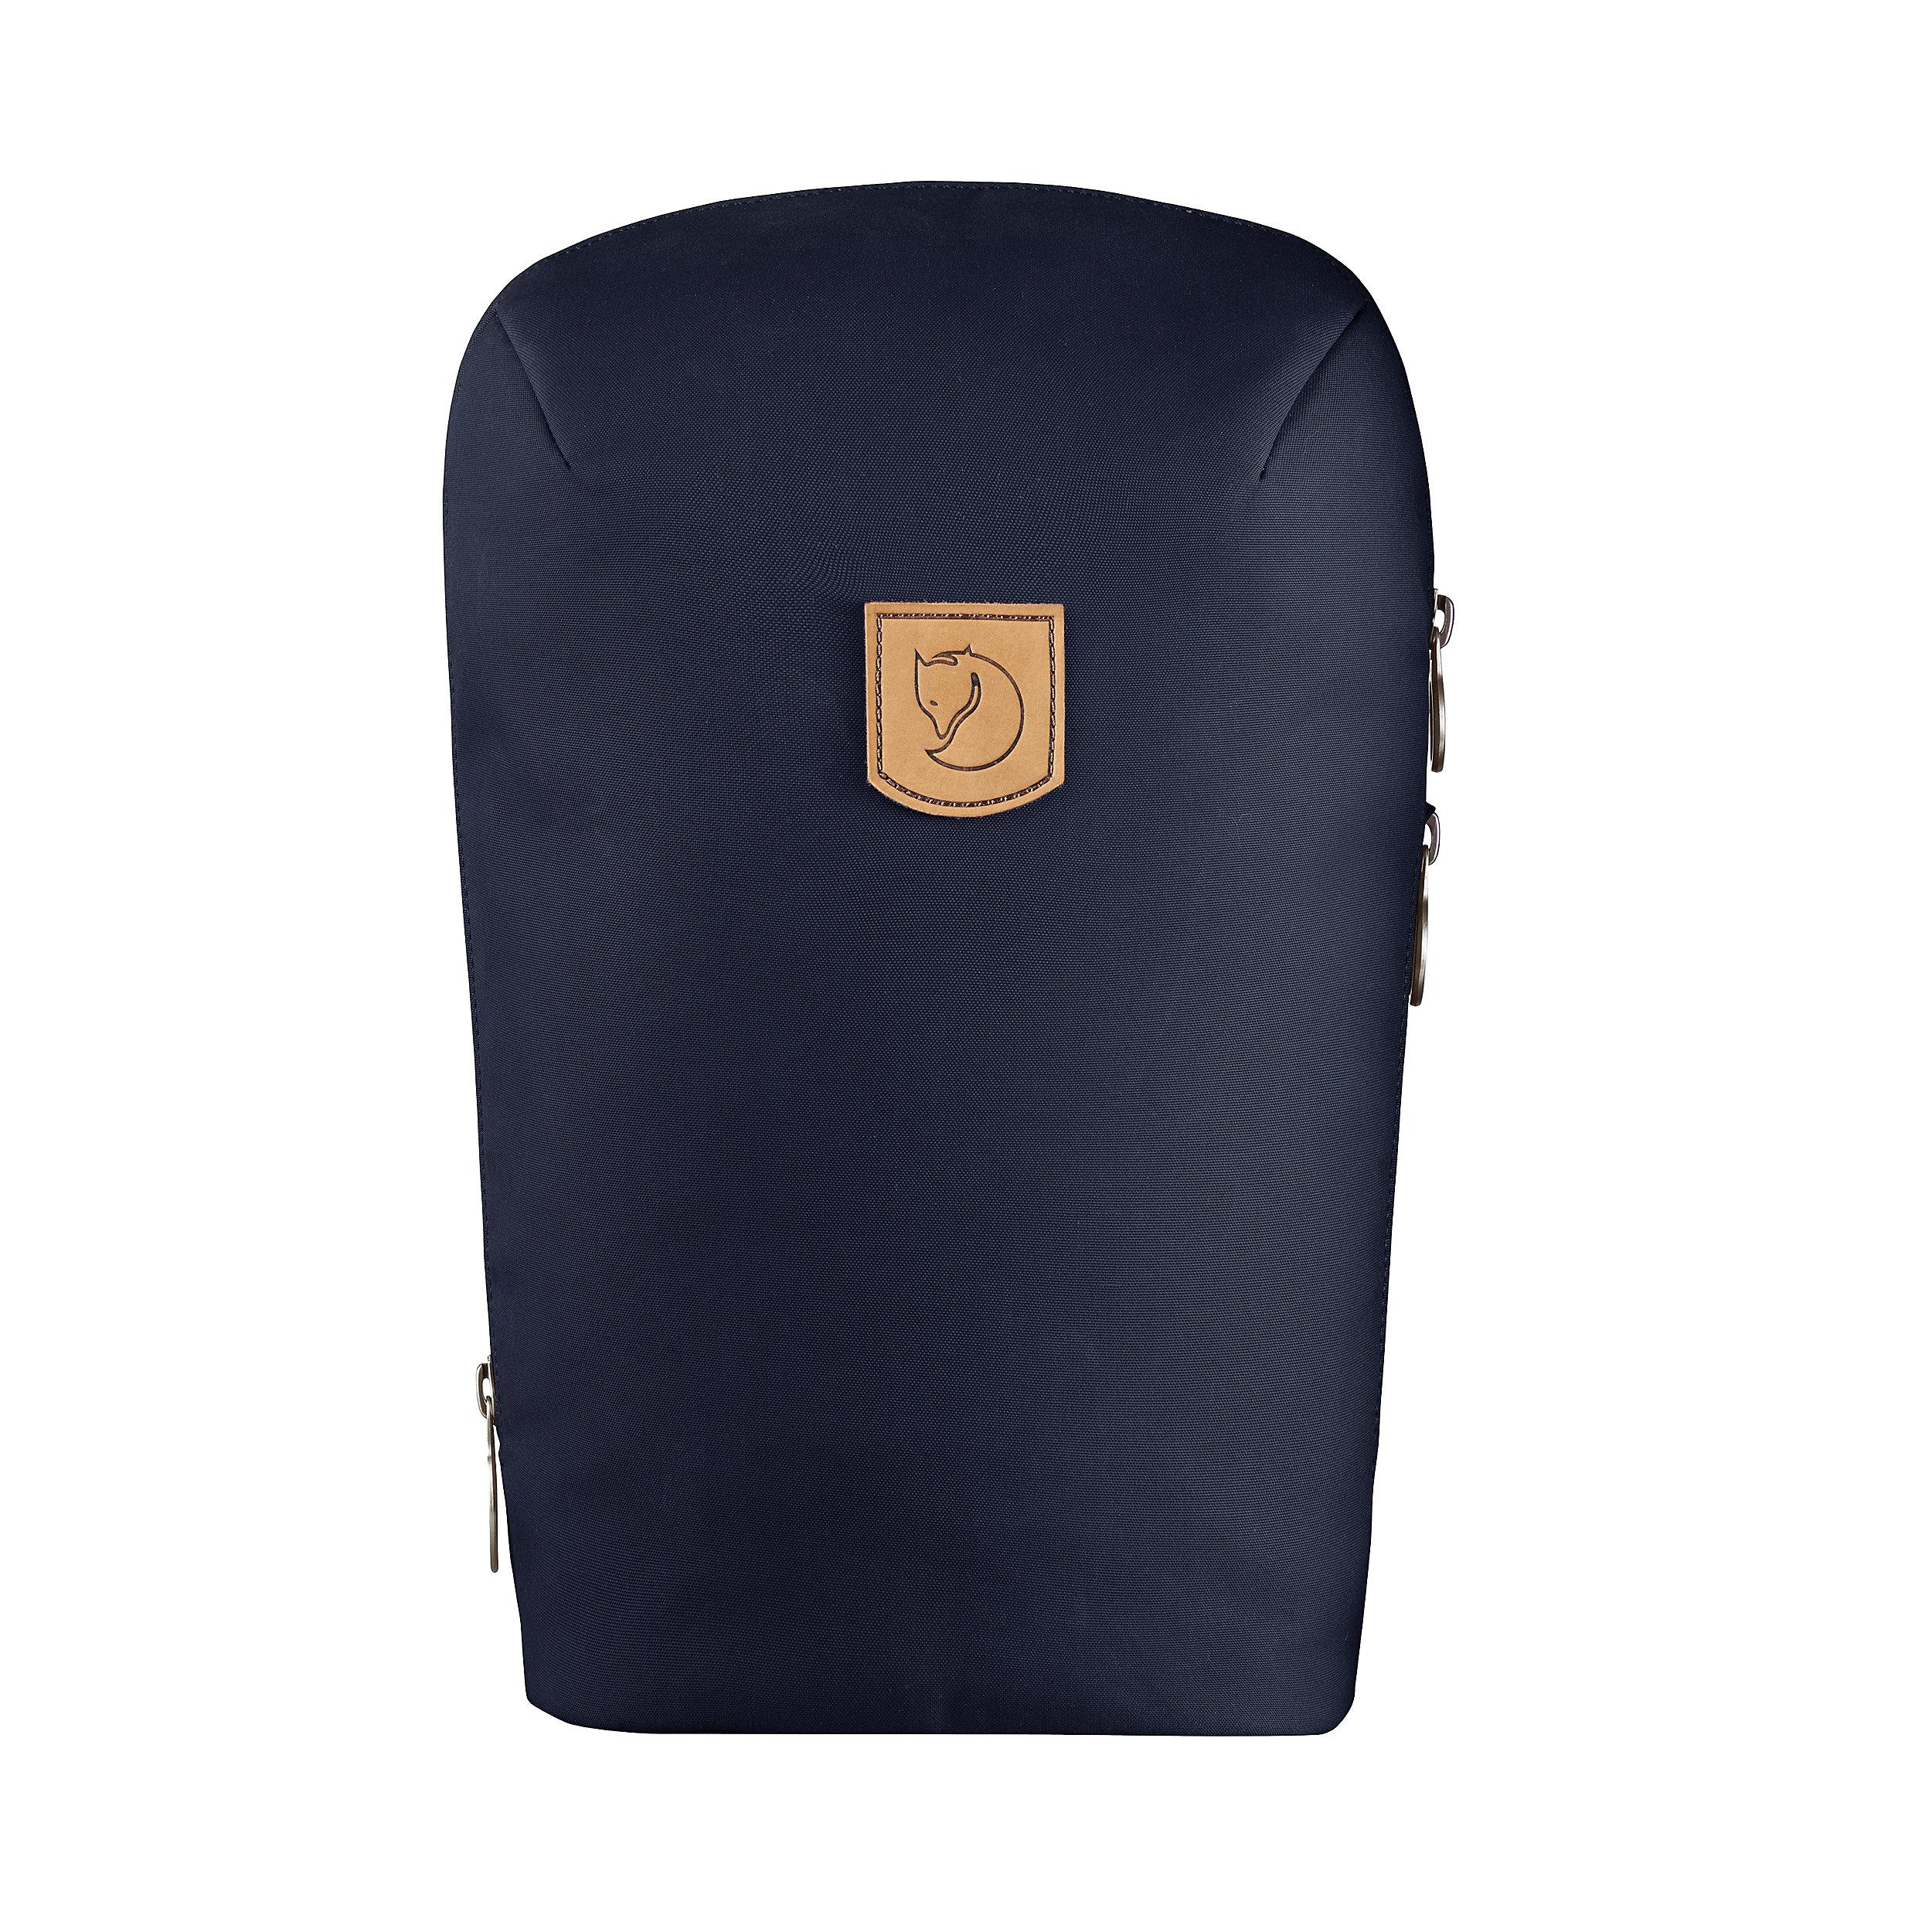 "Leisure Backpack Kiruna 15"" 22 Liter"